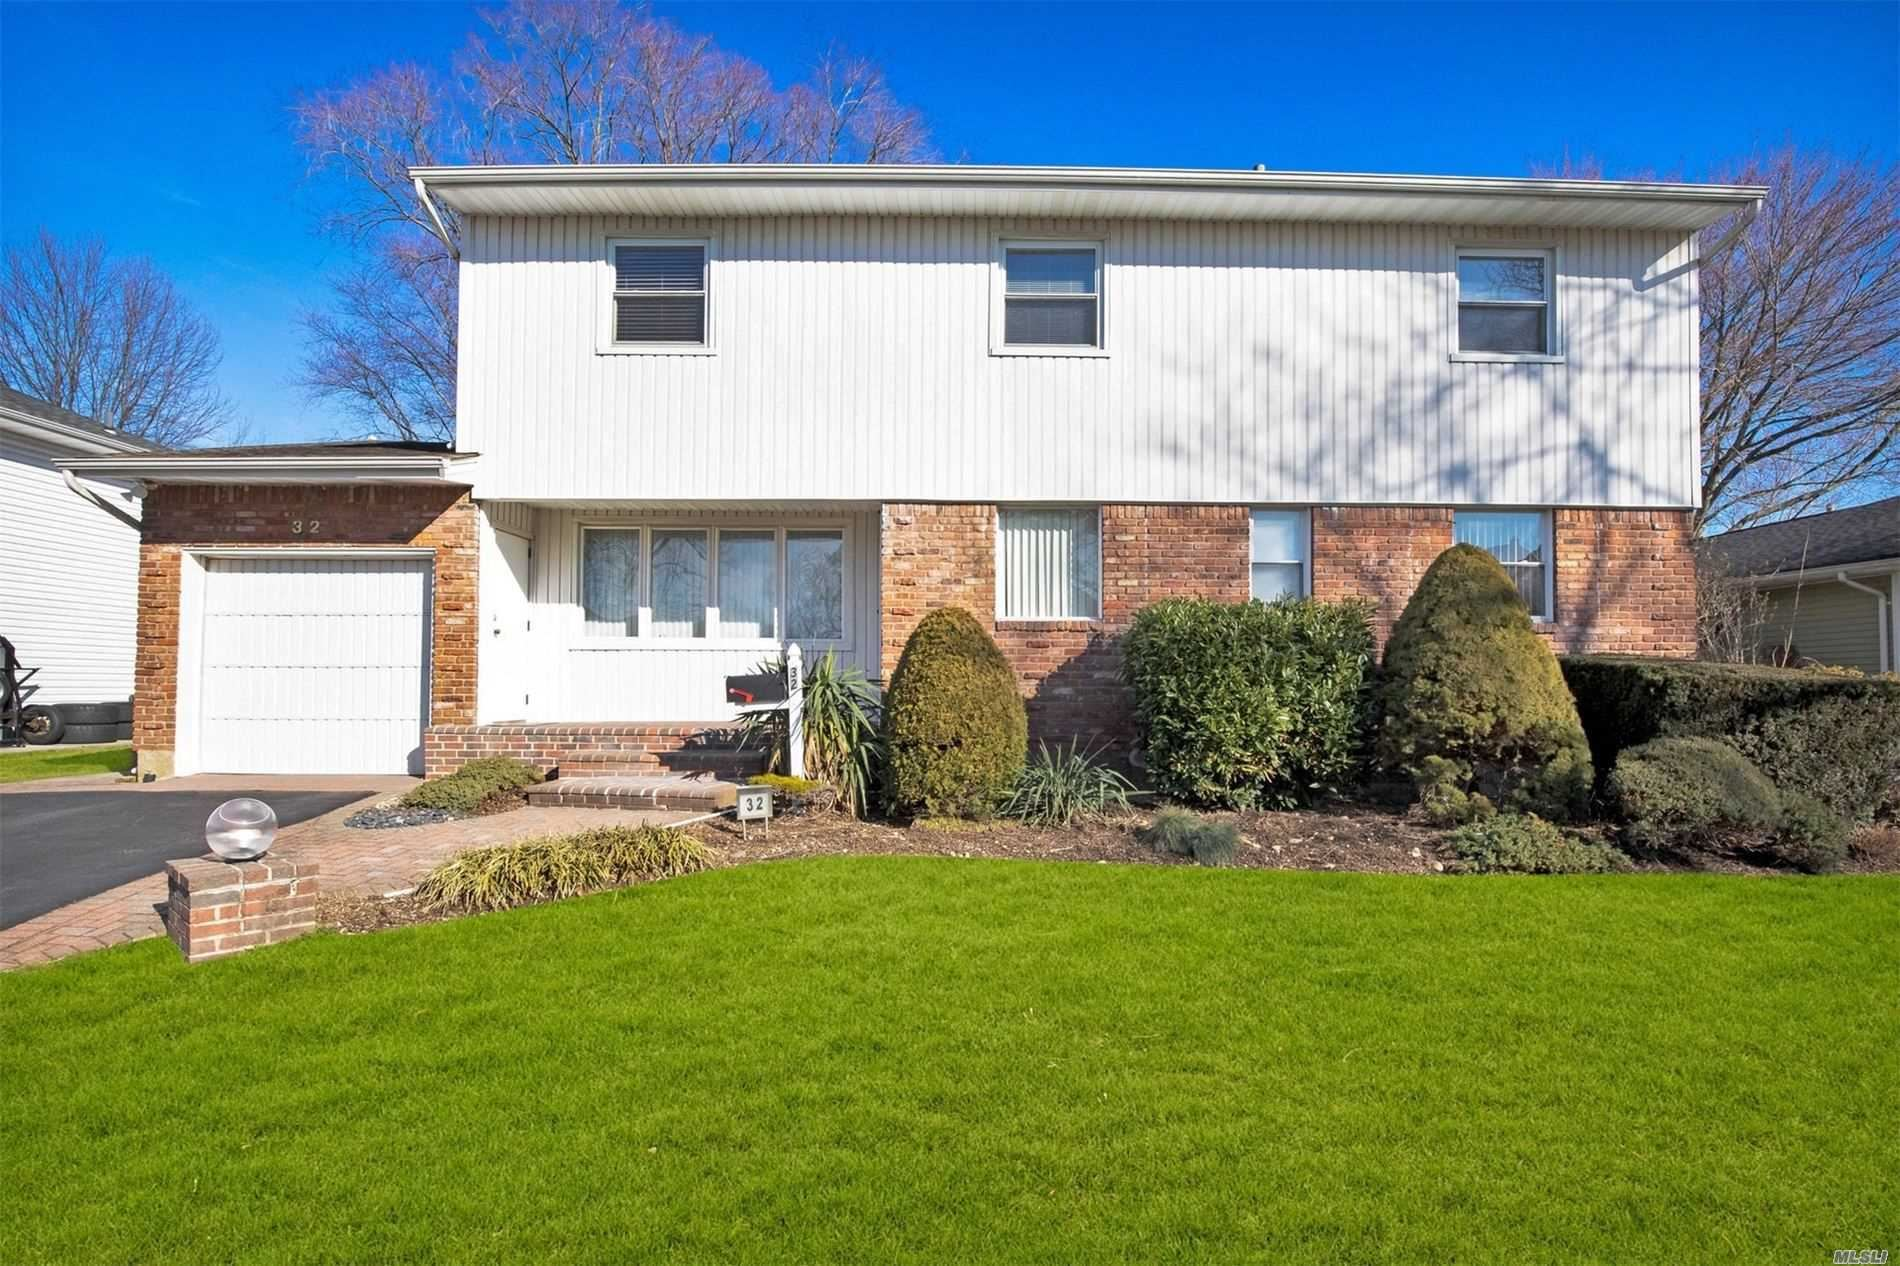 32 Julliard Drive, Plainview, NY 11803 - MLS#: 3201912